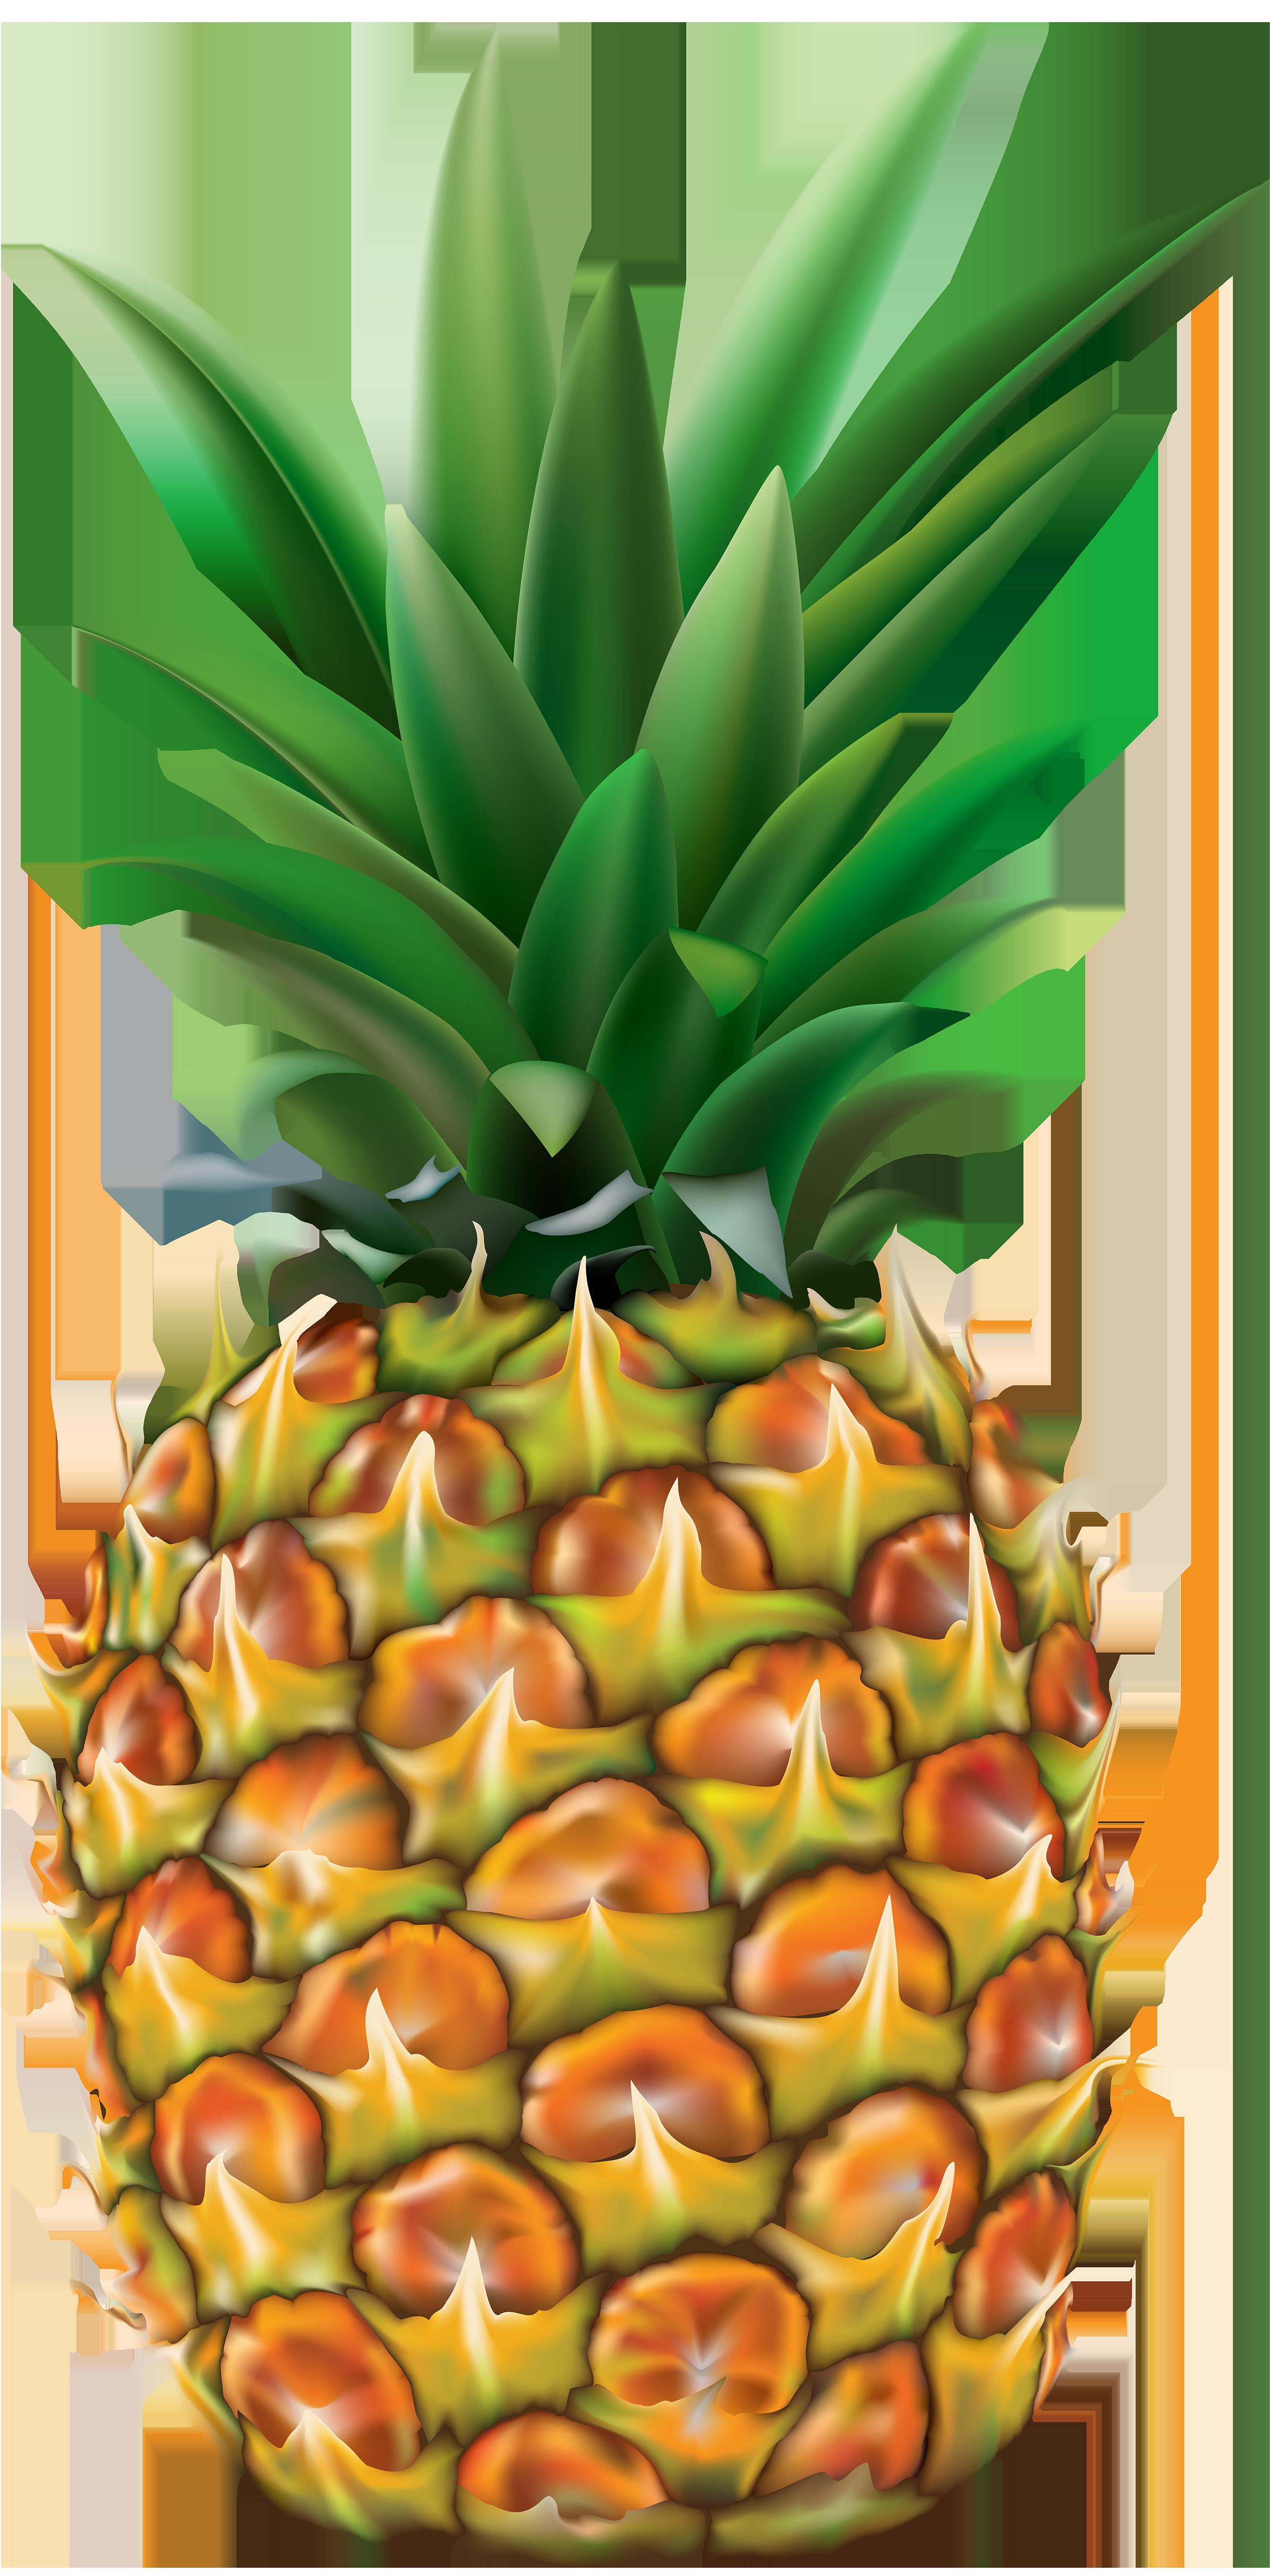 Transparent png clip art. Pineapple clipart